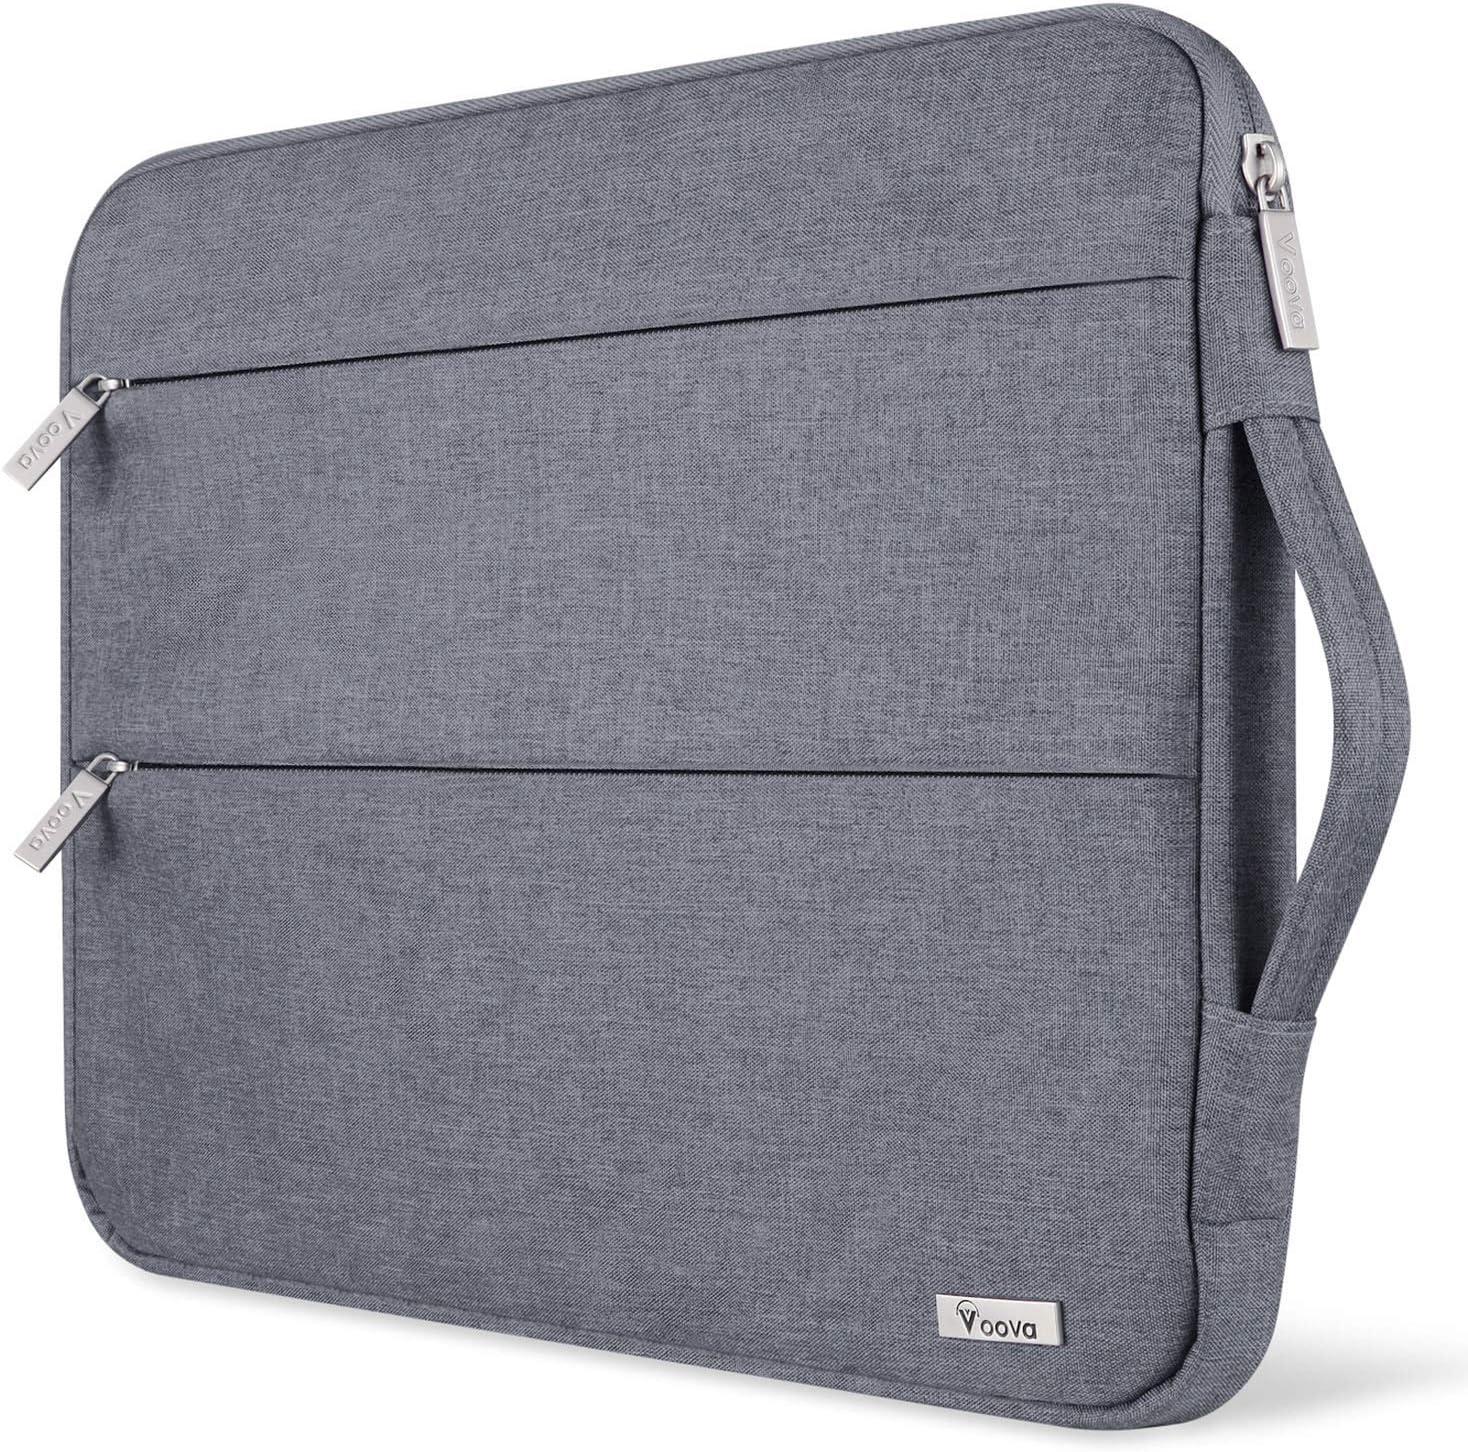 Voova Funda Portátil 11 11.6 12 Pulgadas Impermeable para Computadora de Múltiples Bolsillos, Compatible con MacBook Air,Chromebook,Surface ProX/7/6/5/4/3, iPad Pro 12.9 con Asa,(Gris)